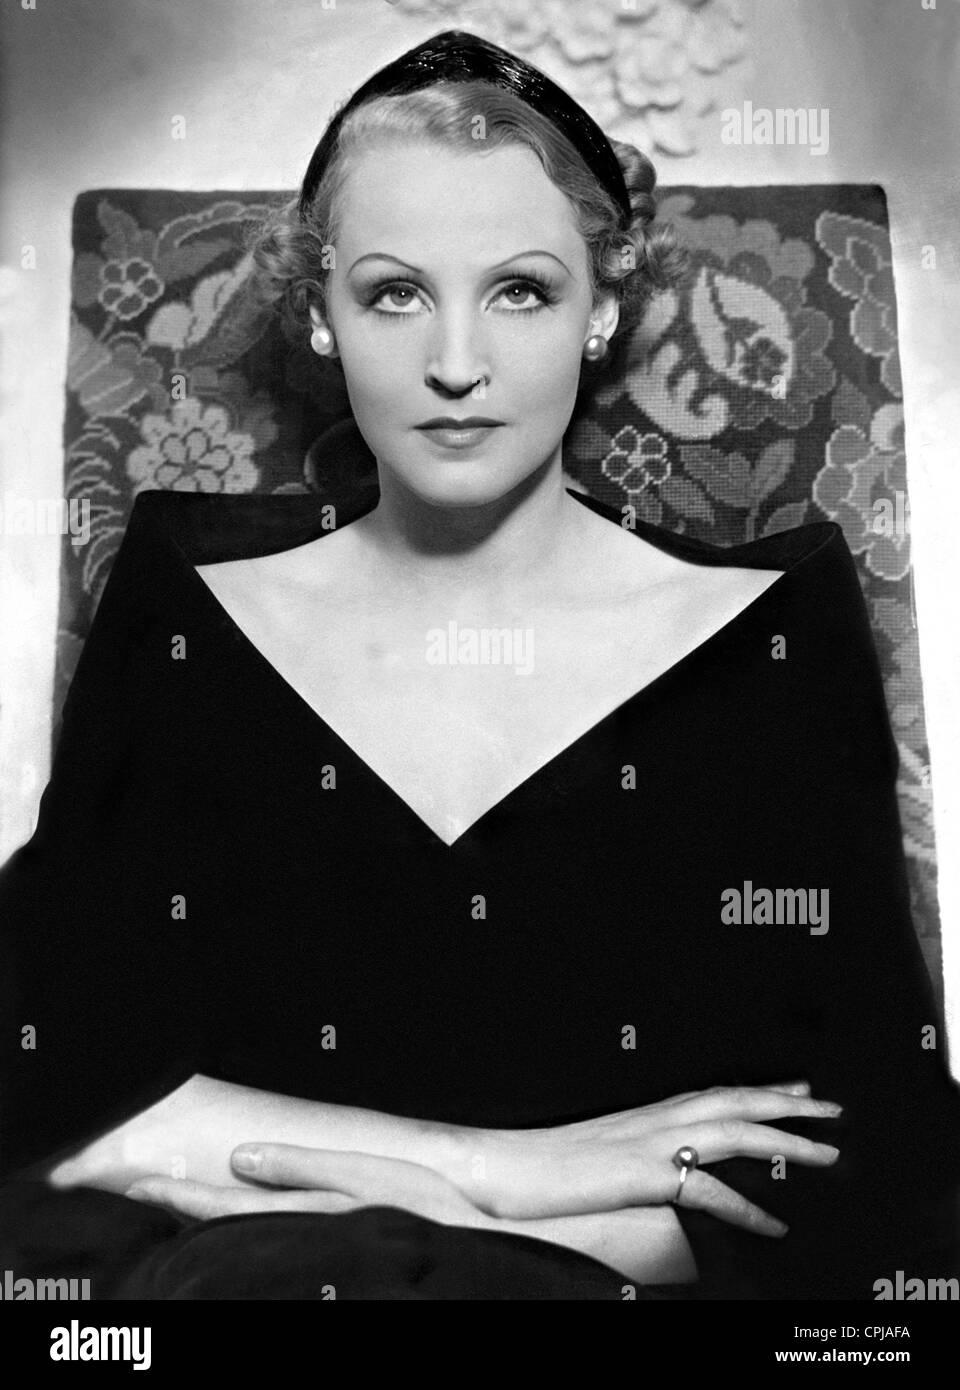 Brigitte Helm atlantis